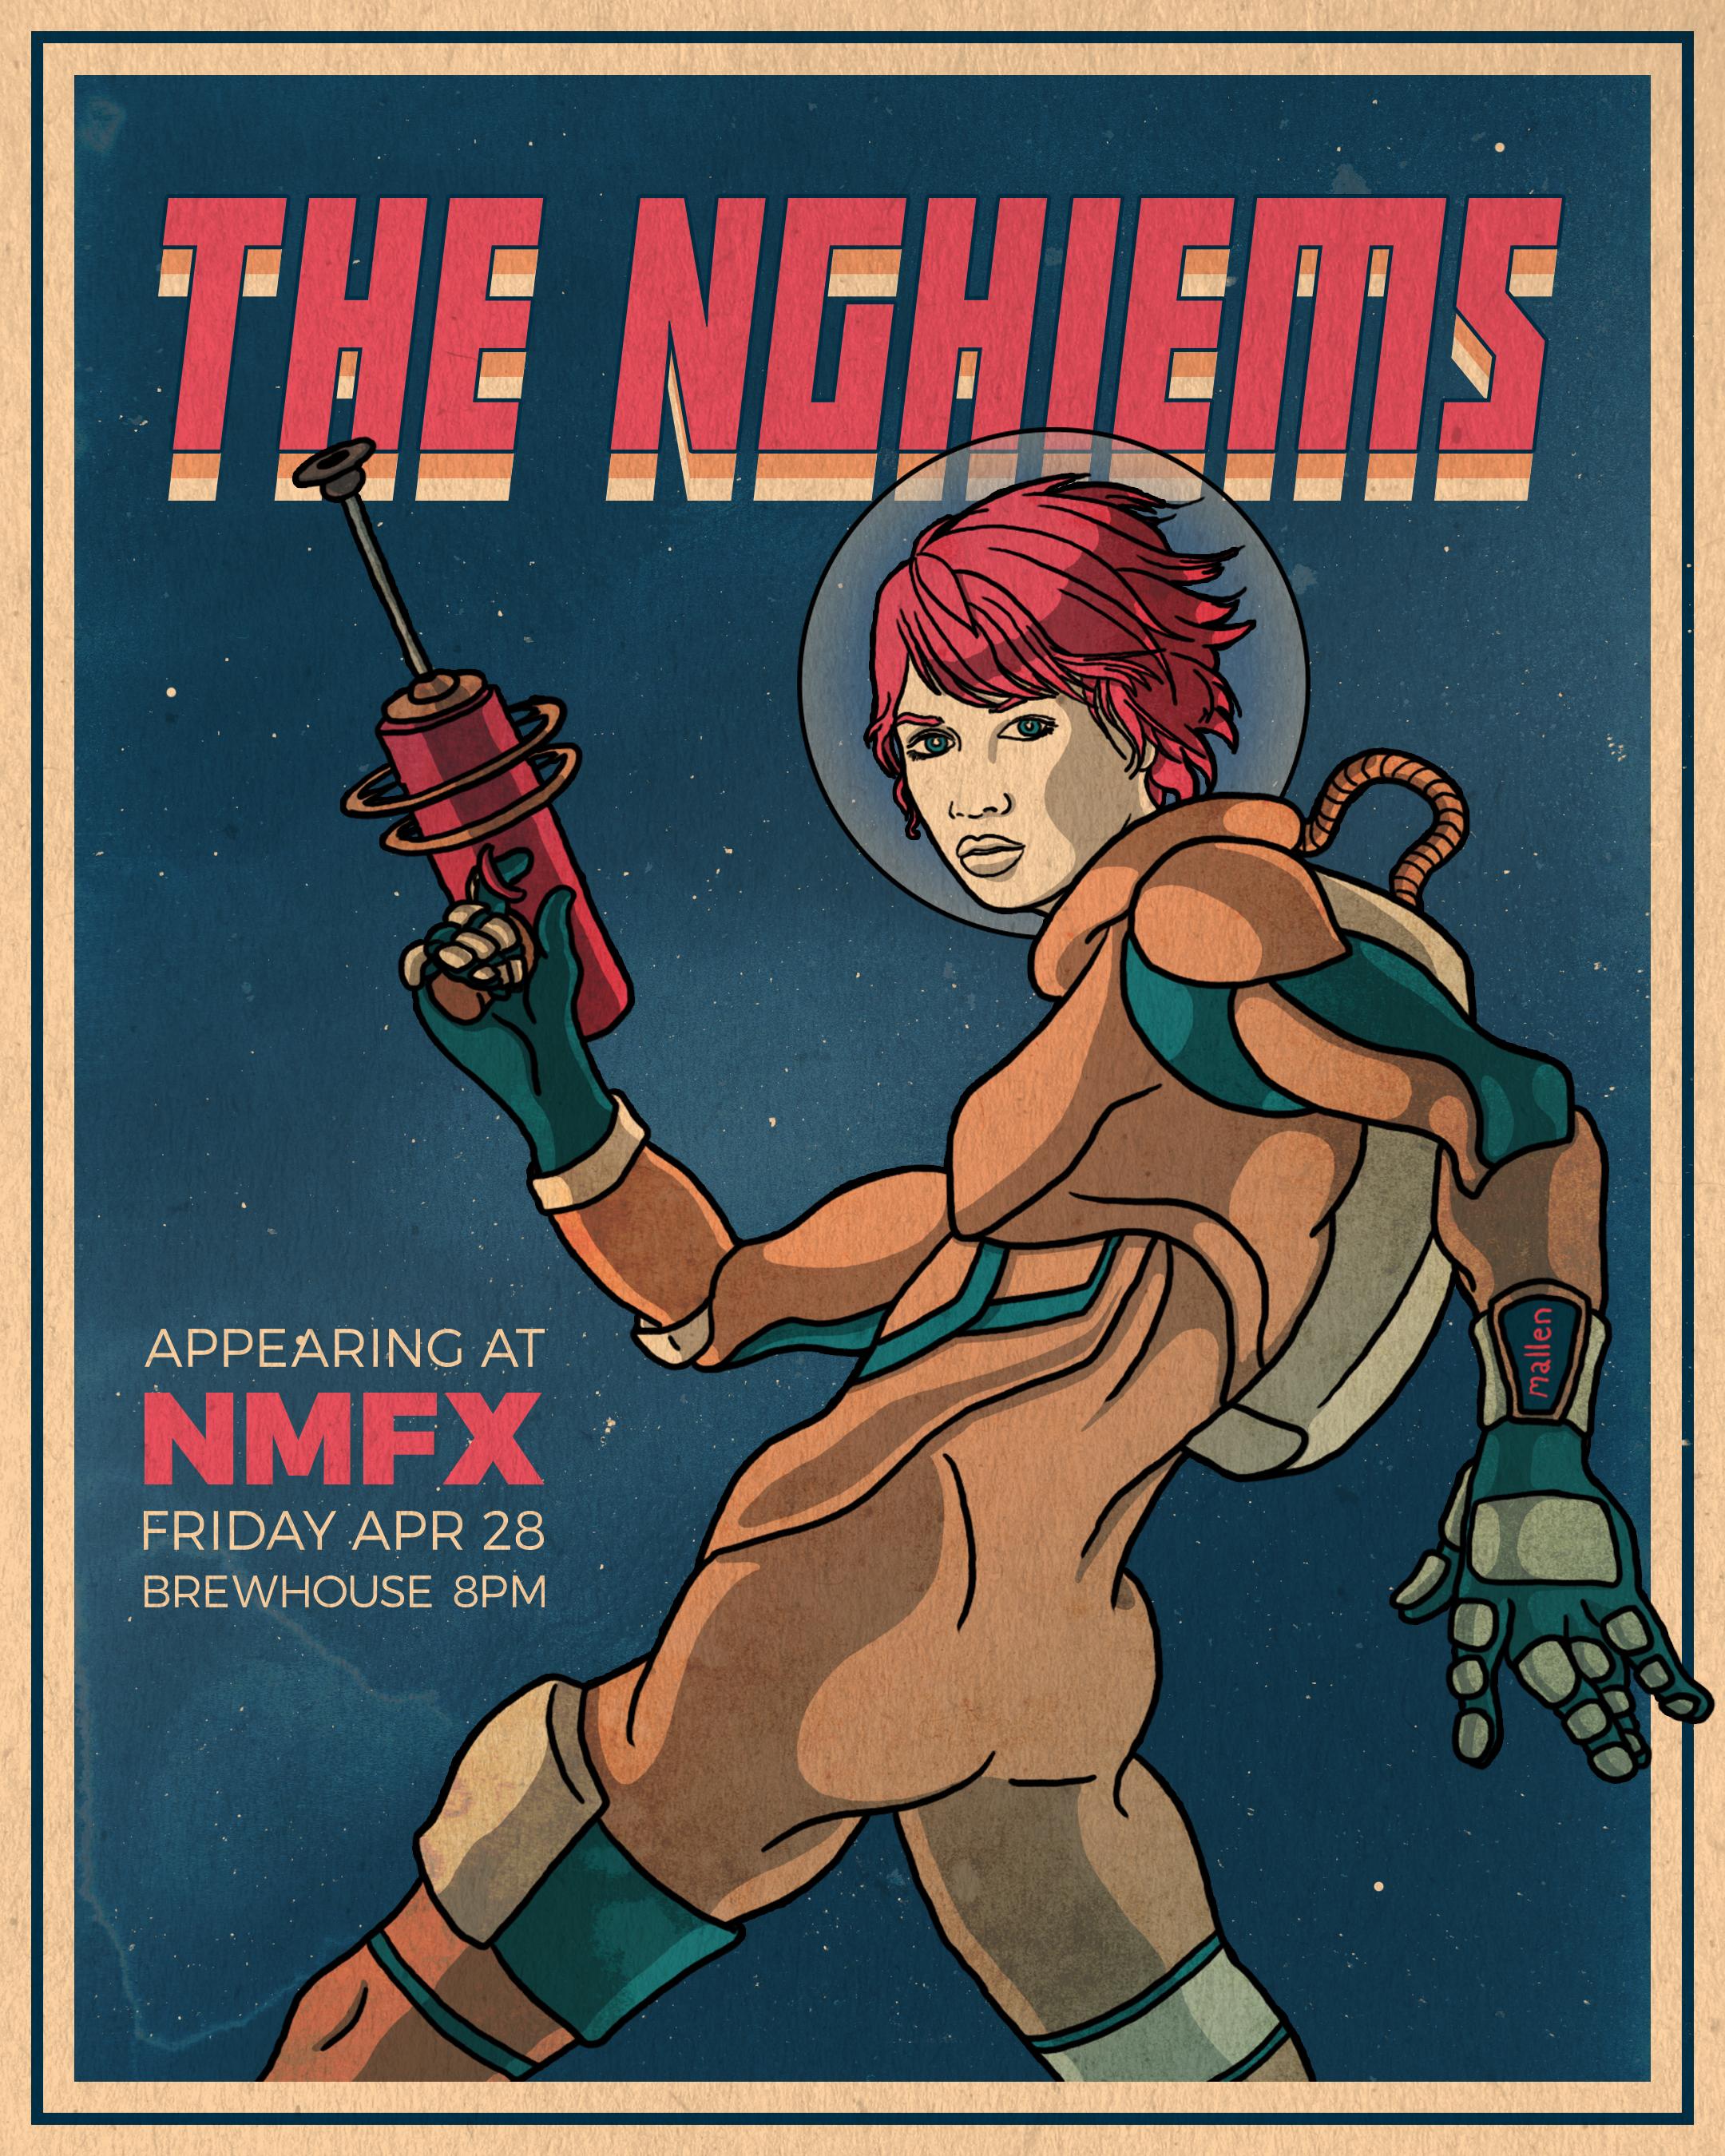 Nghiems NMFX poster 2 final.jpg